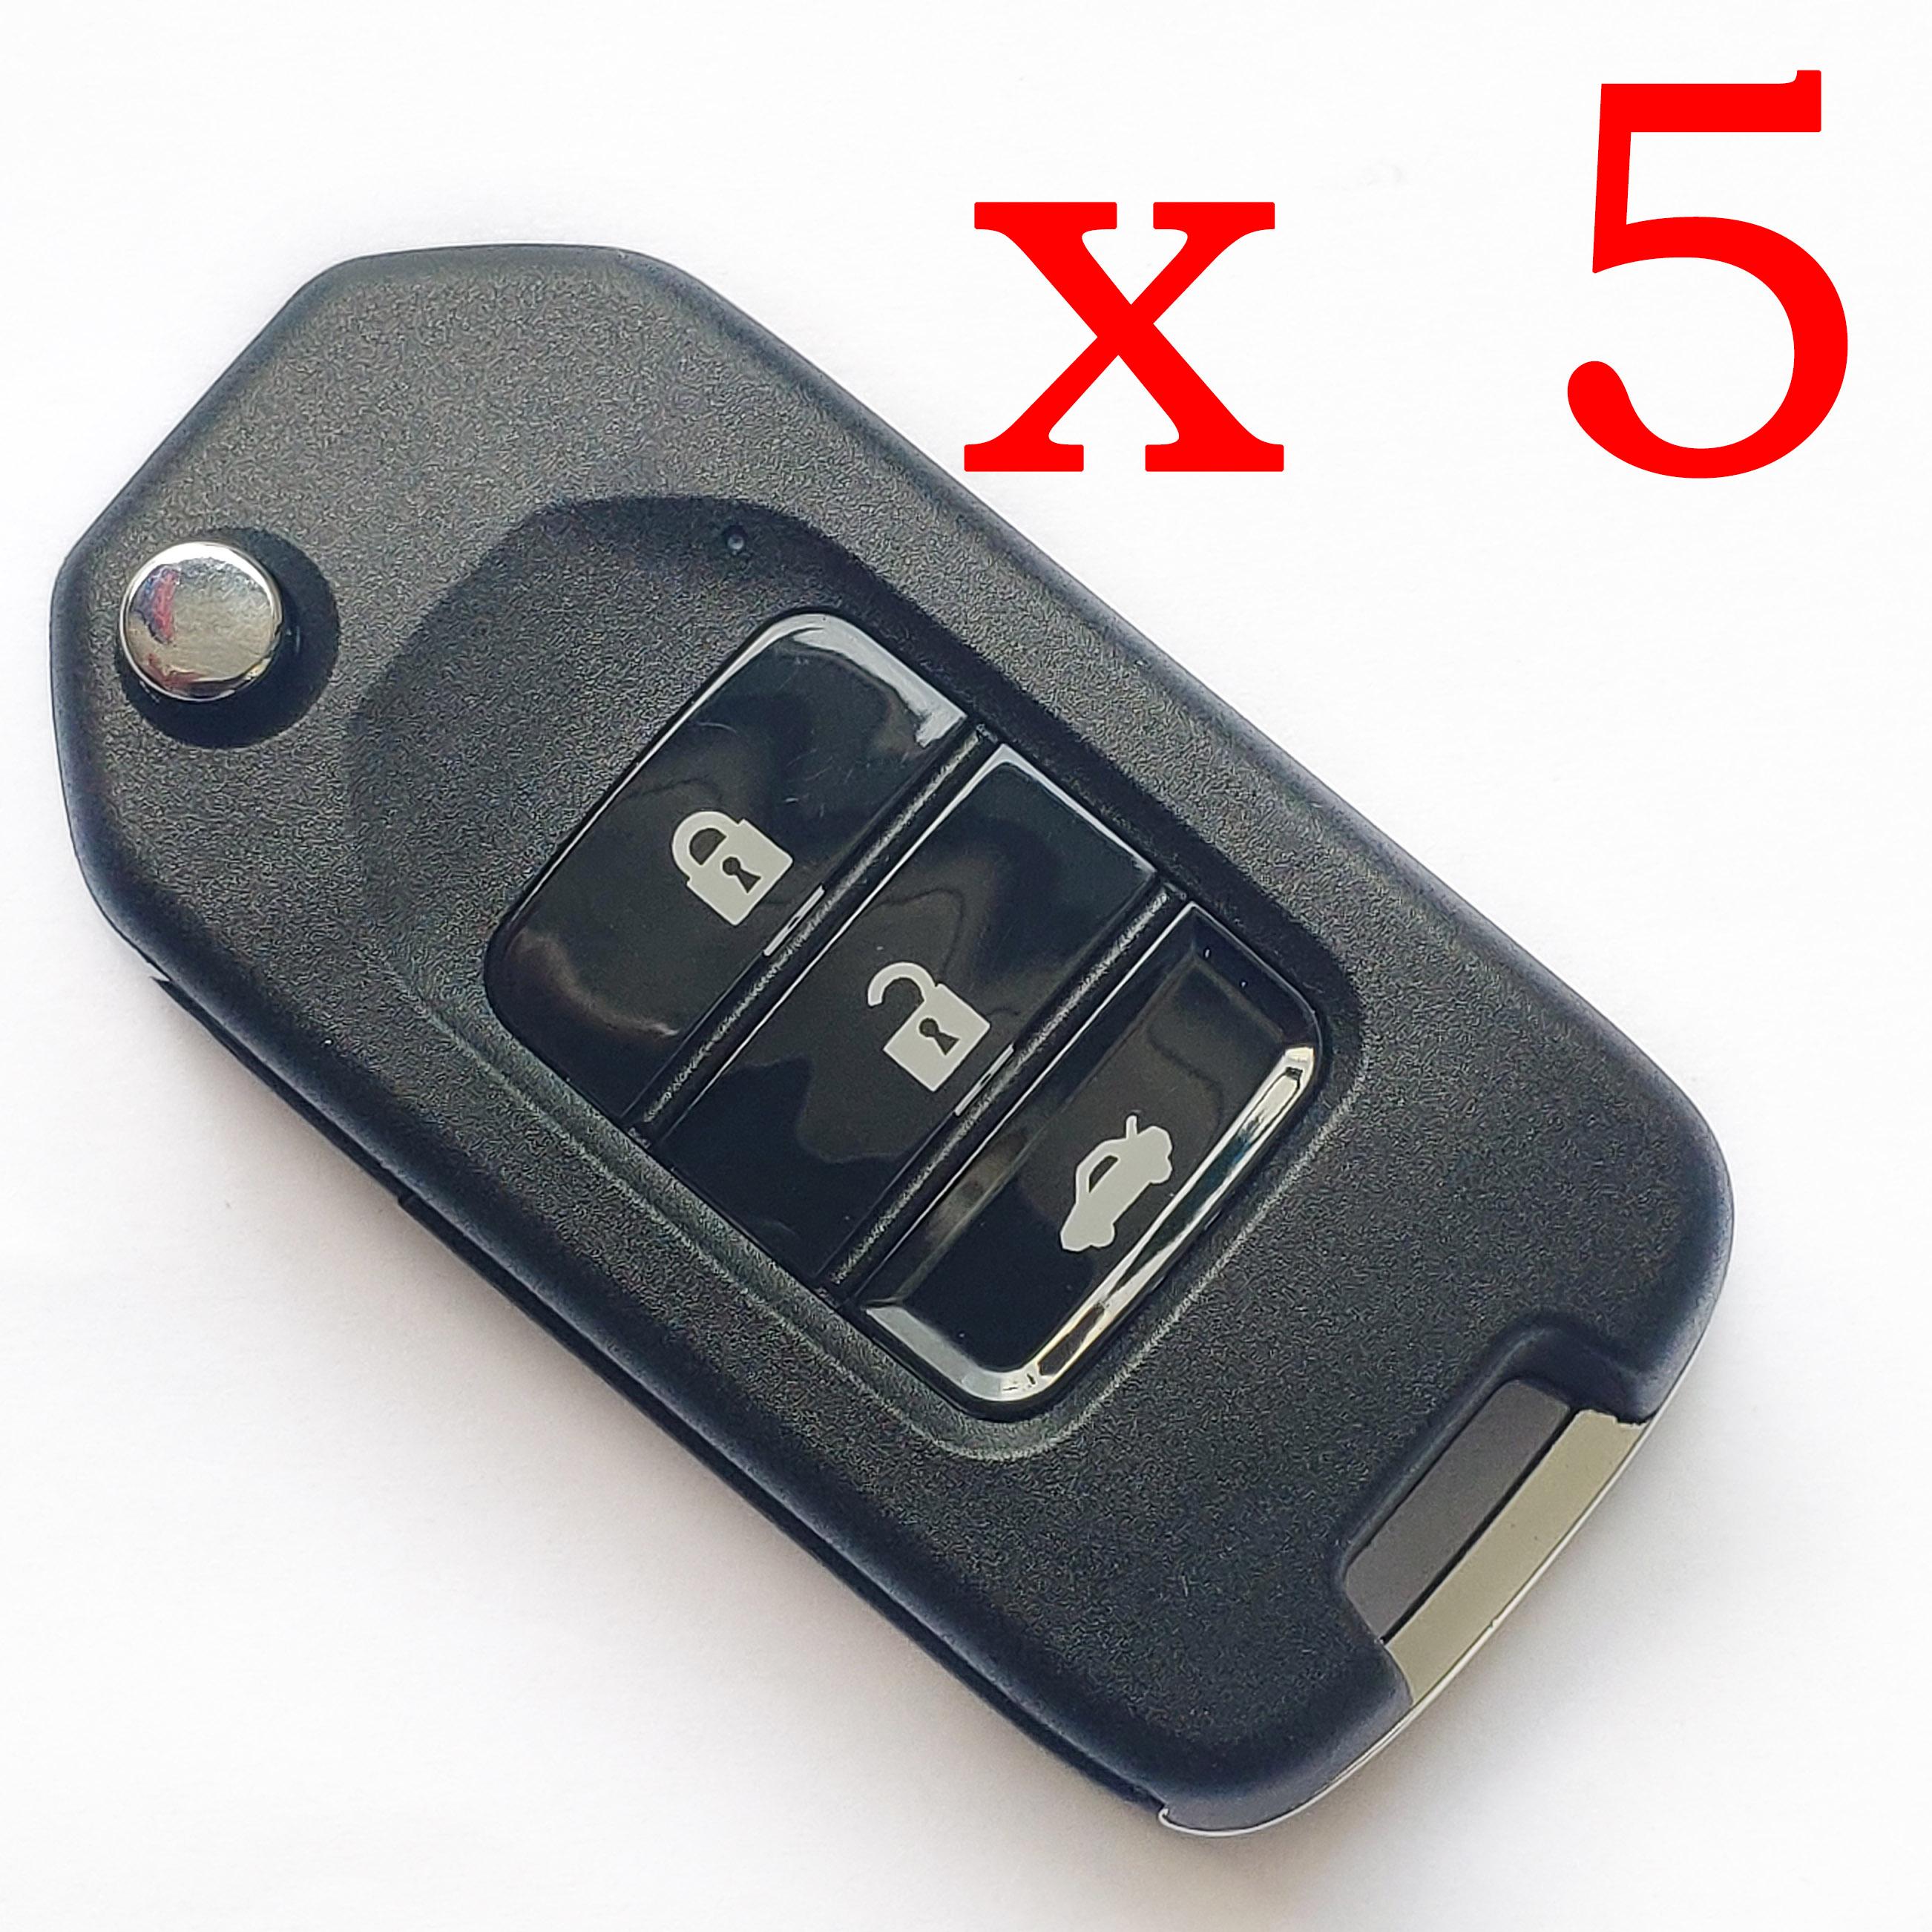 5 pieces Xhorse VVDI Honda Type Universal Remote Control - XKHO00EN